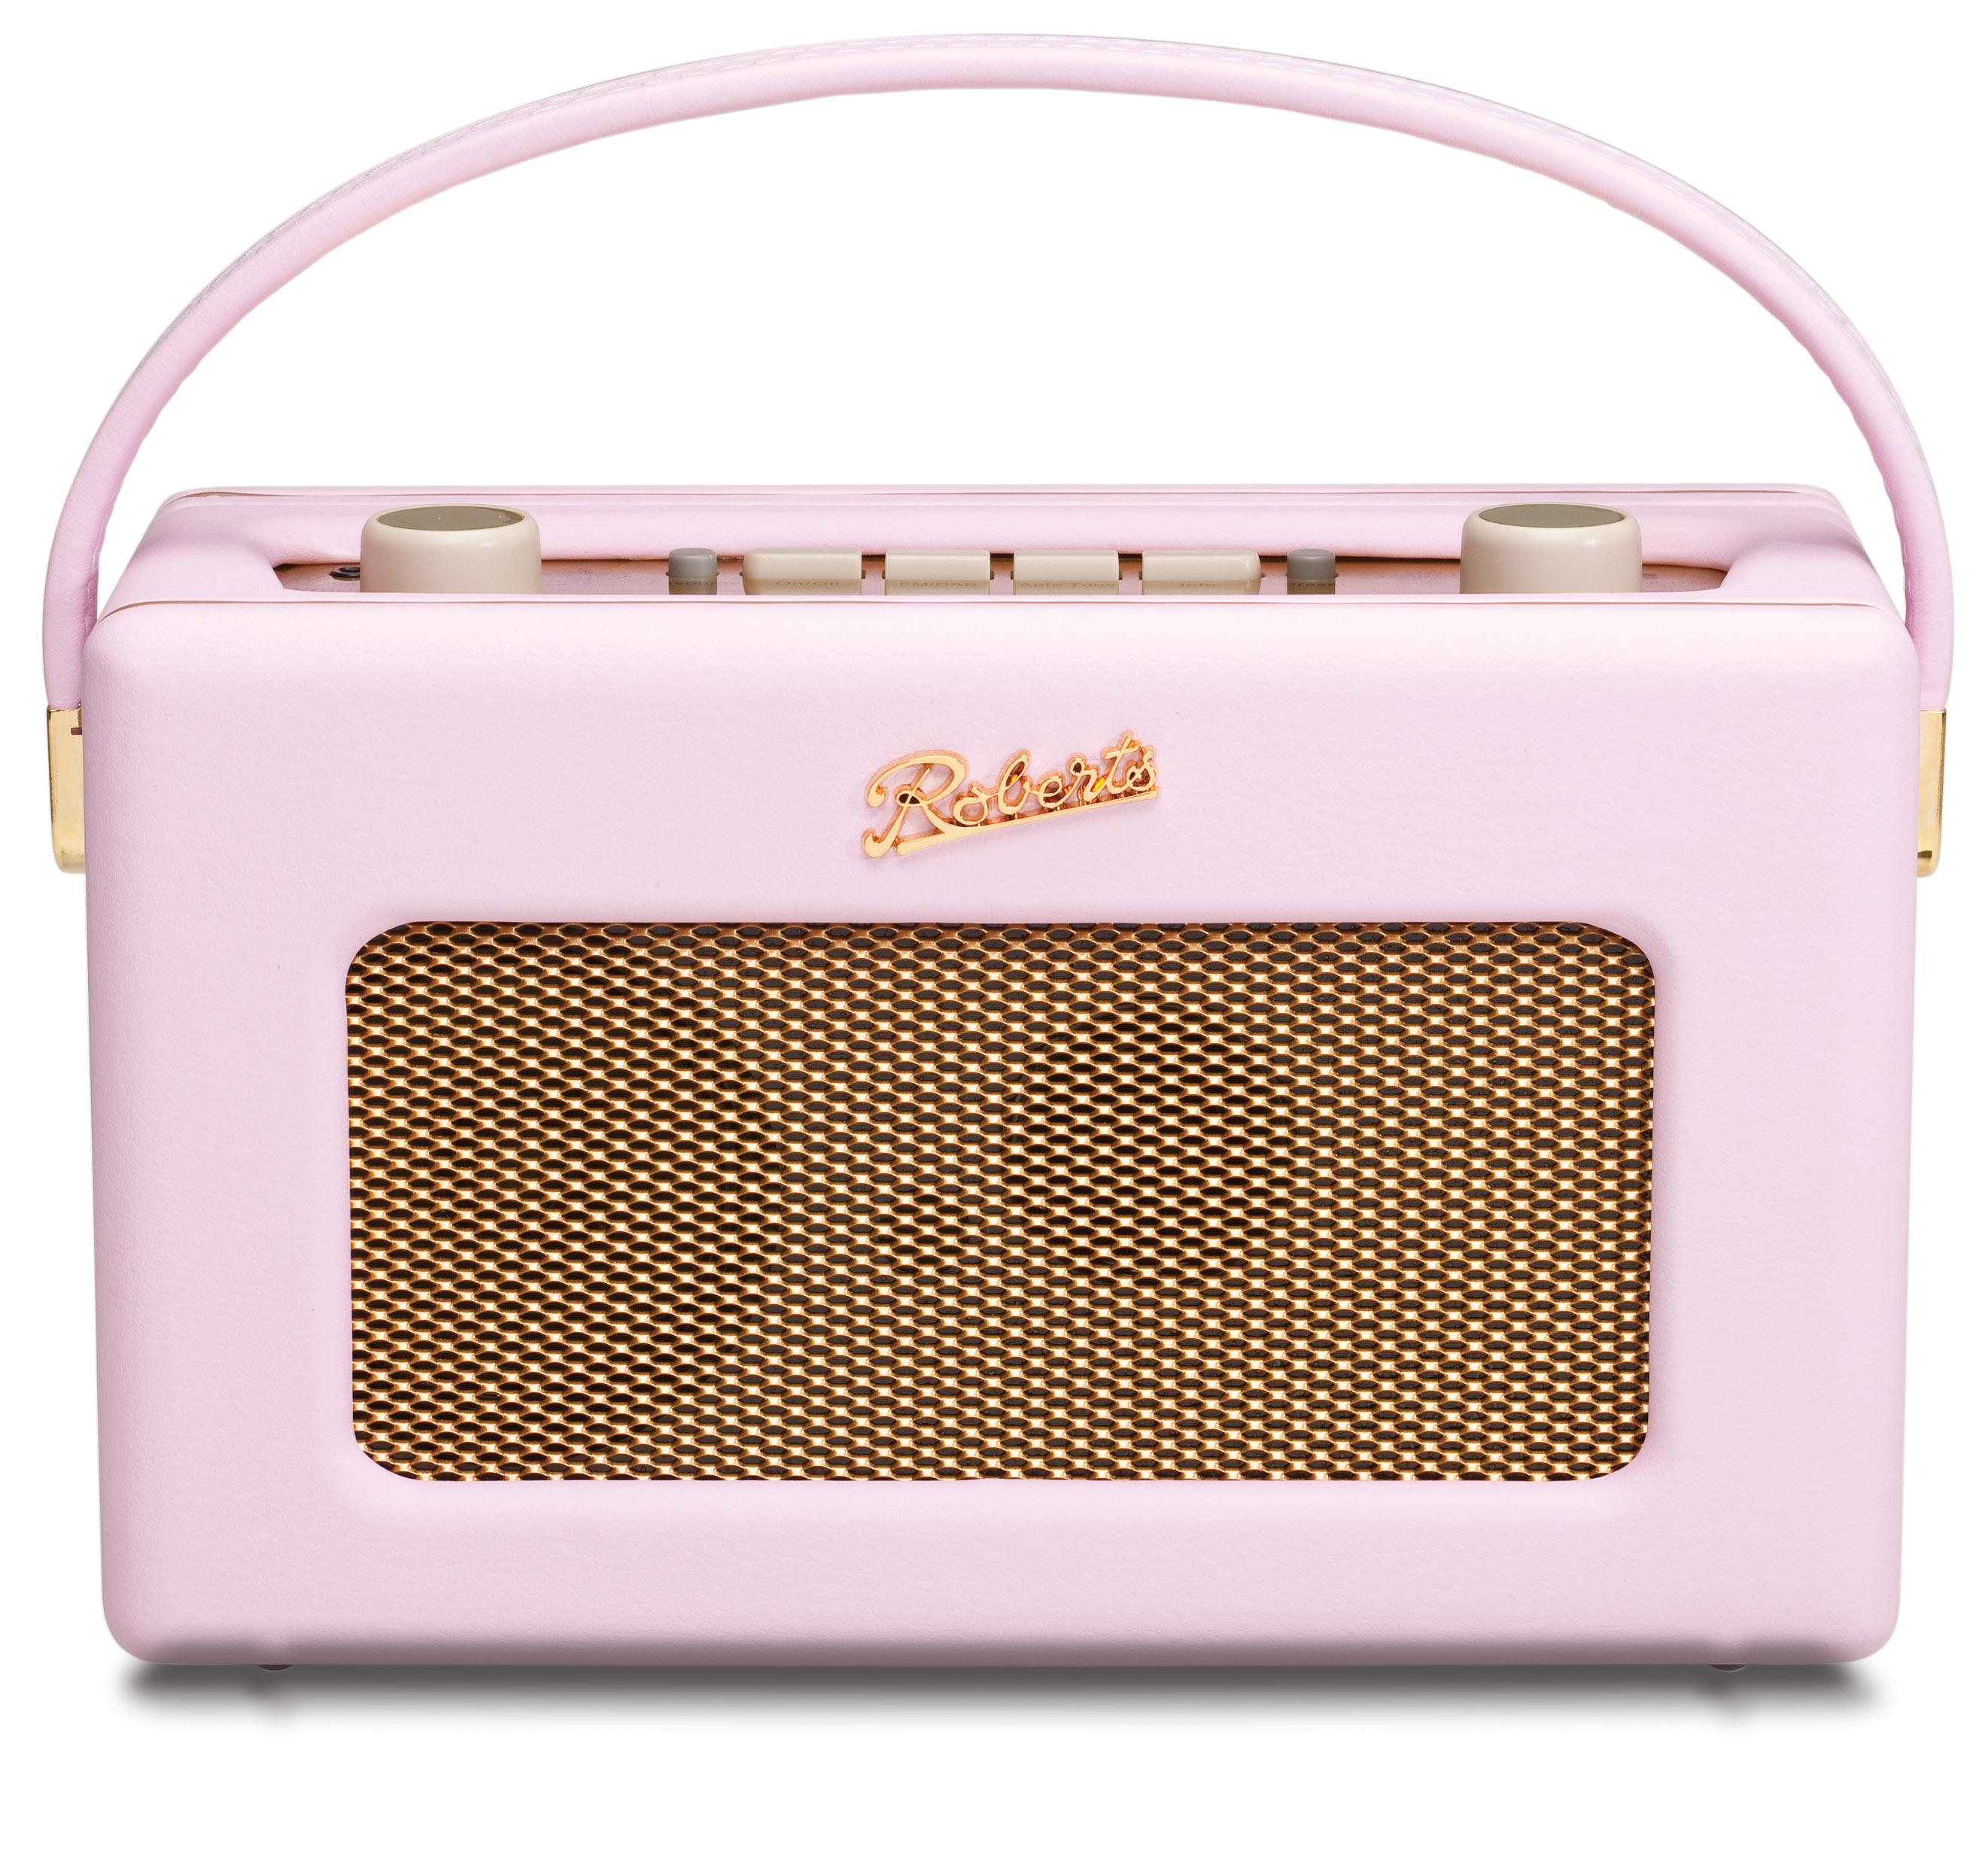 Roberts Radio Revival RD60 FM/ DAB/ DAB+ Pink (130-313016)